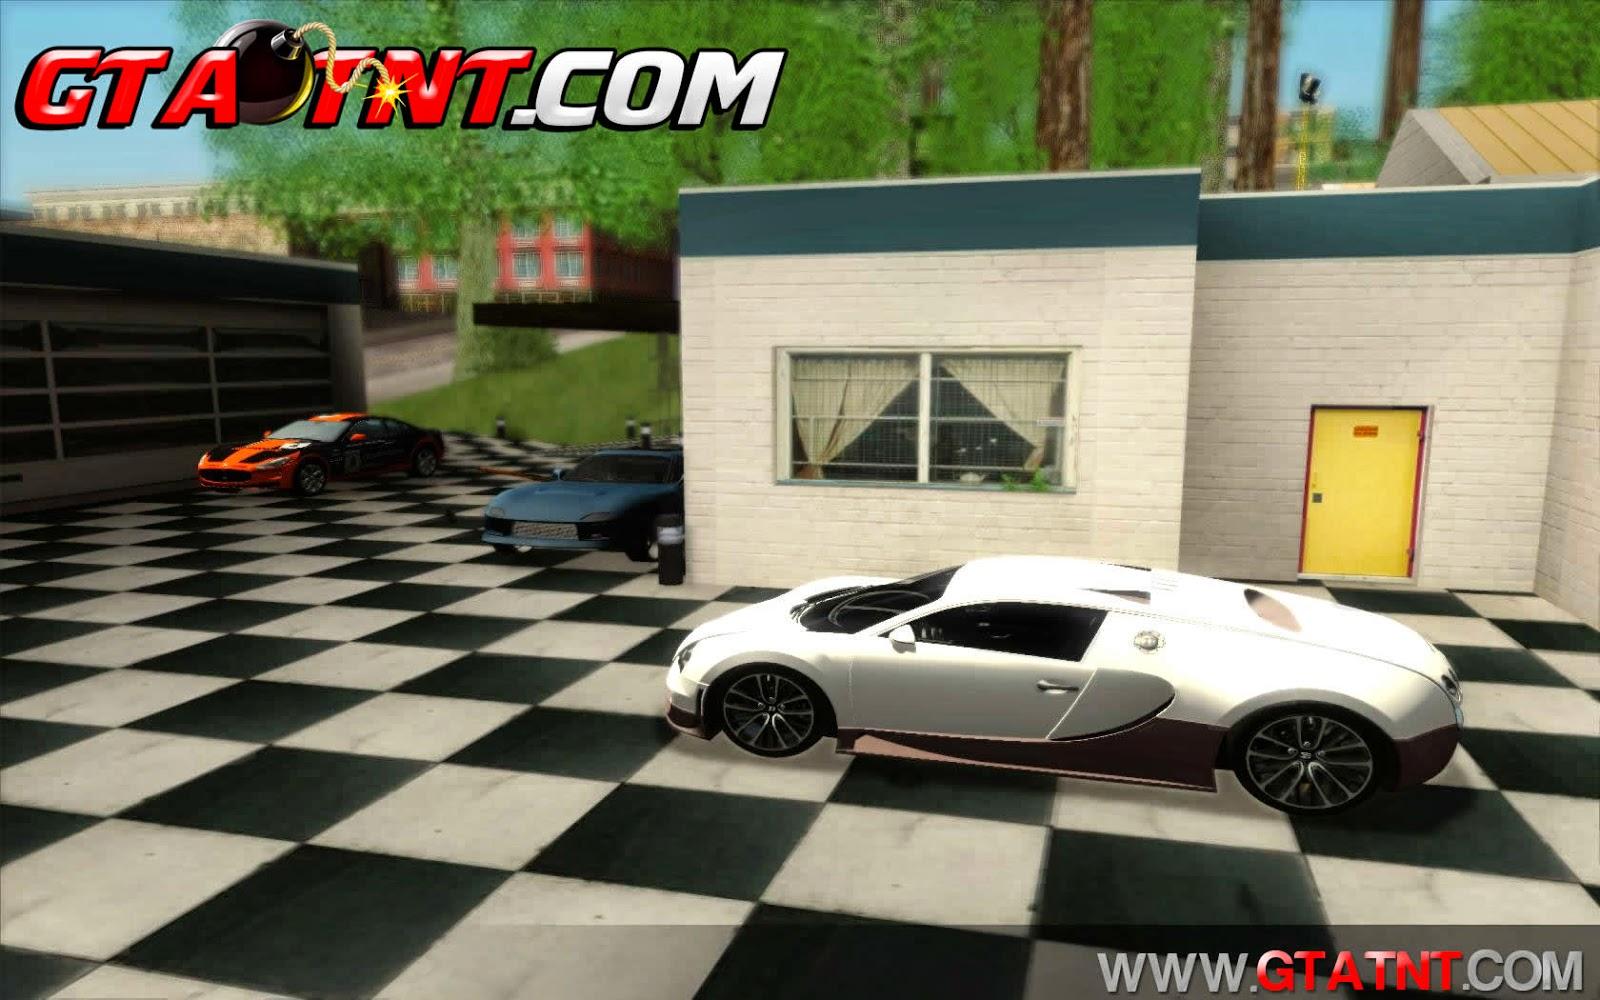 Carros estacionados em Doherty para GTA San Andreas